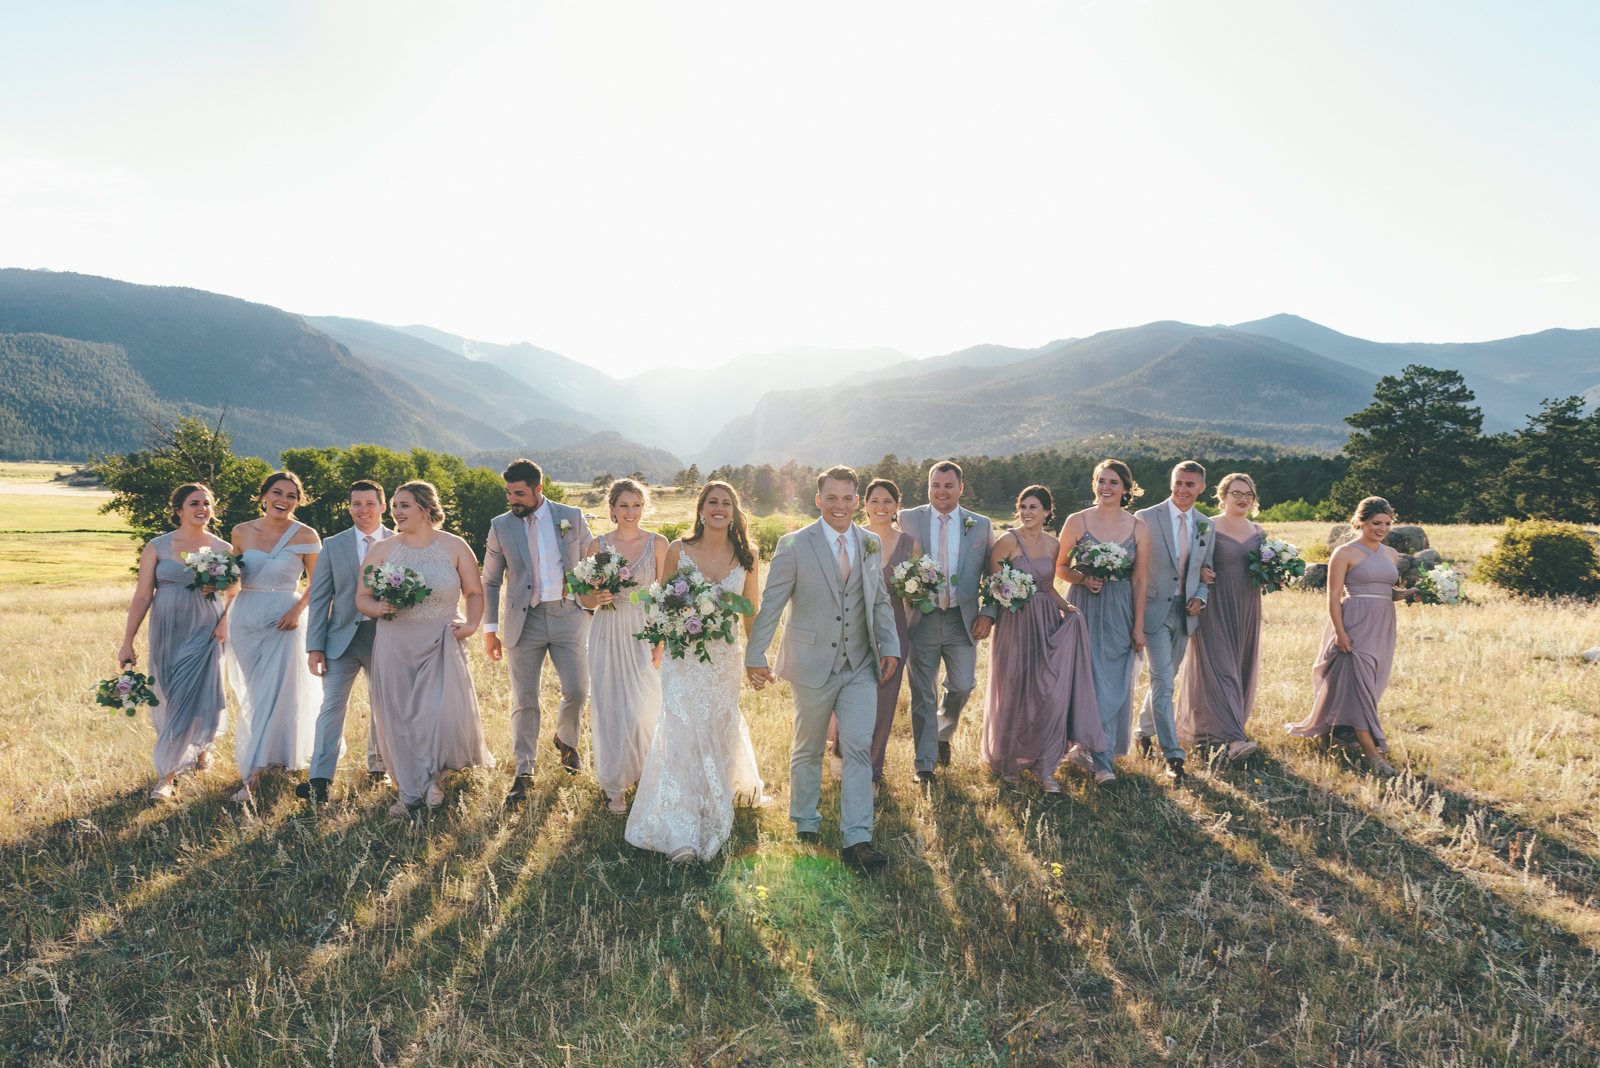 ChadFahnestockPhotography-jf-honeymoon030.jpg